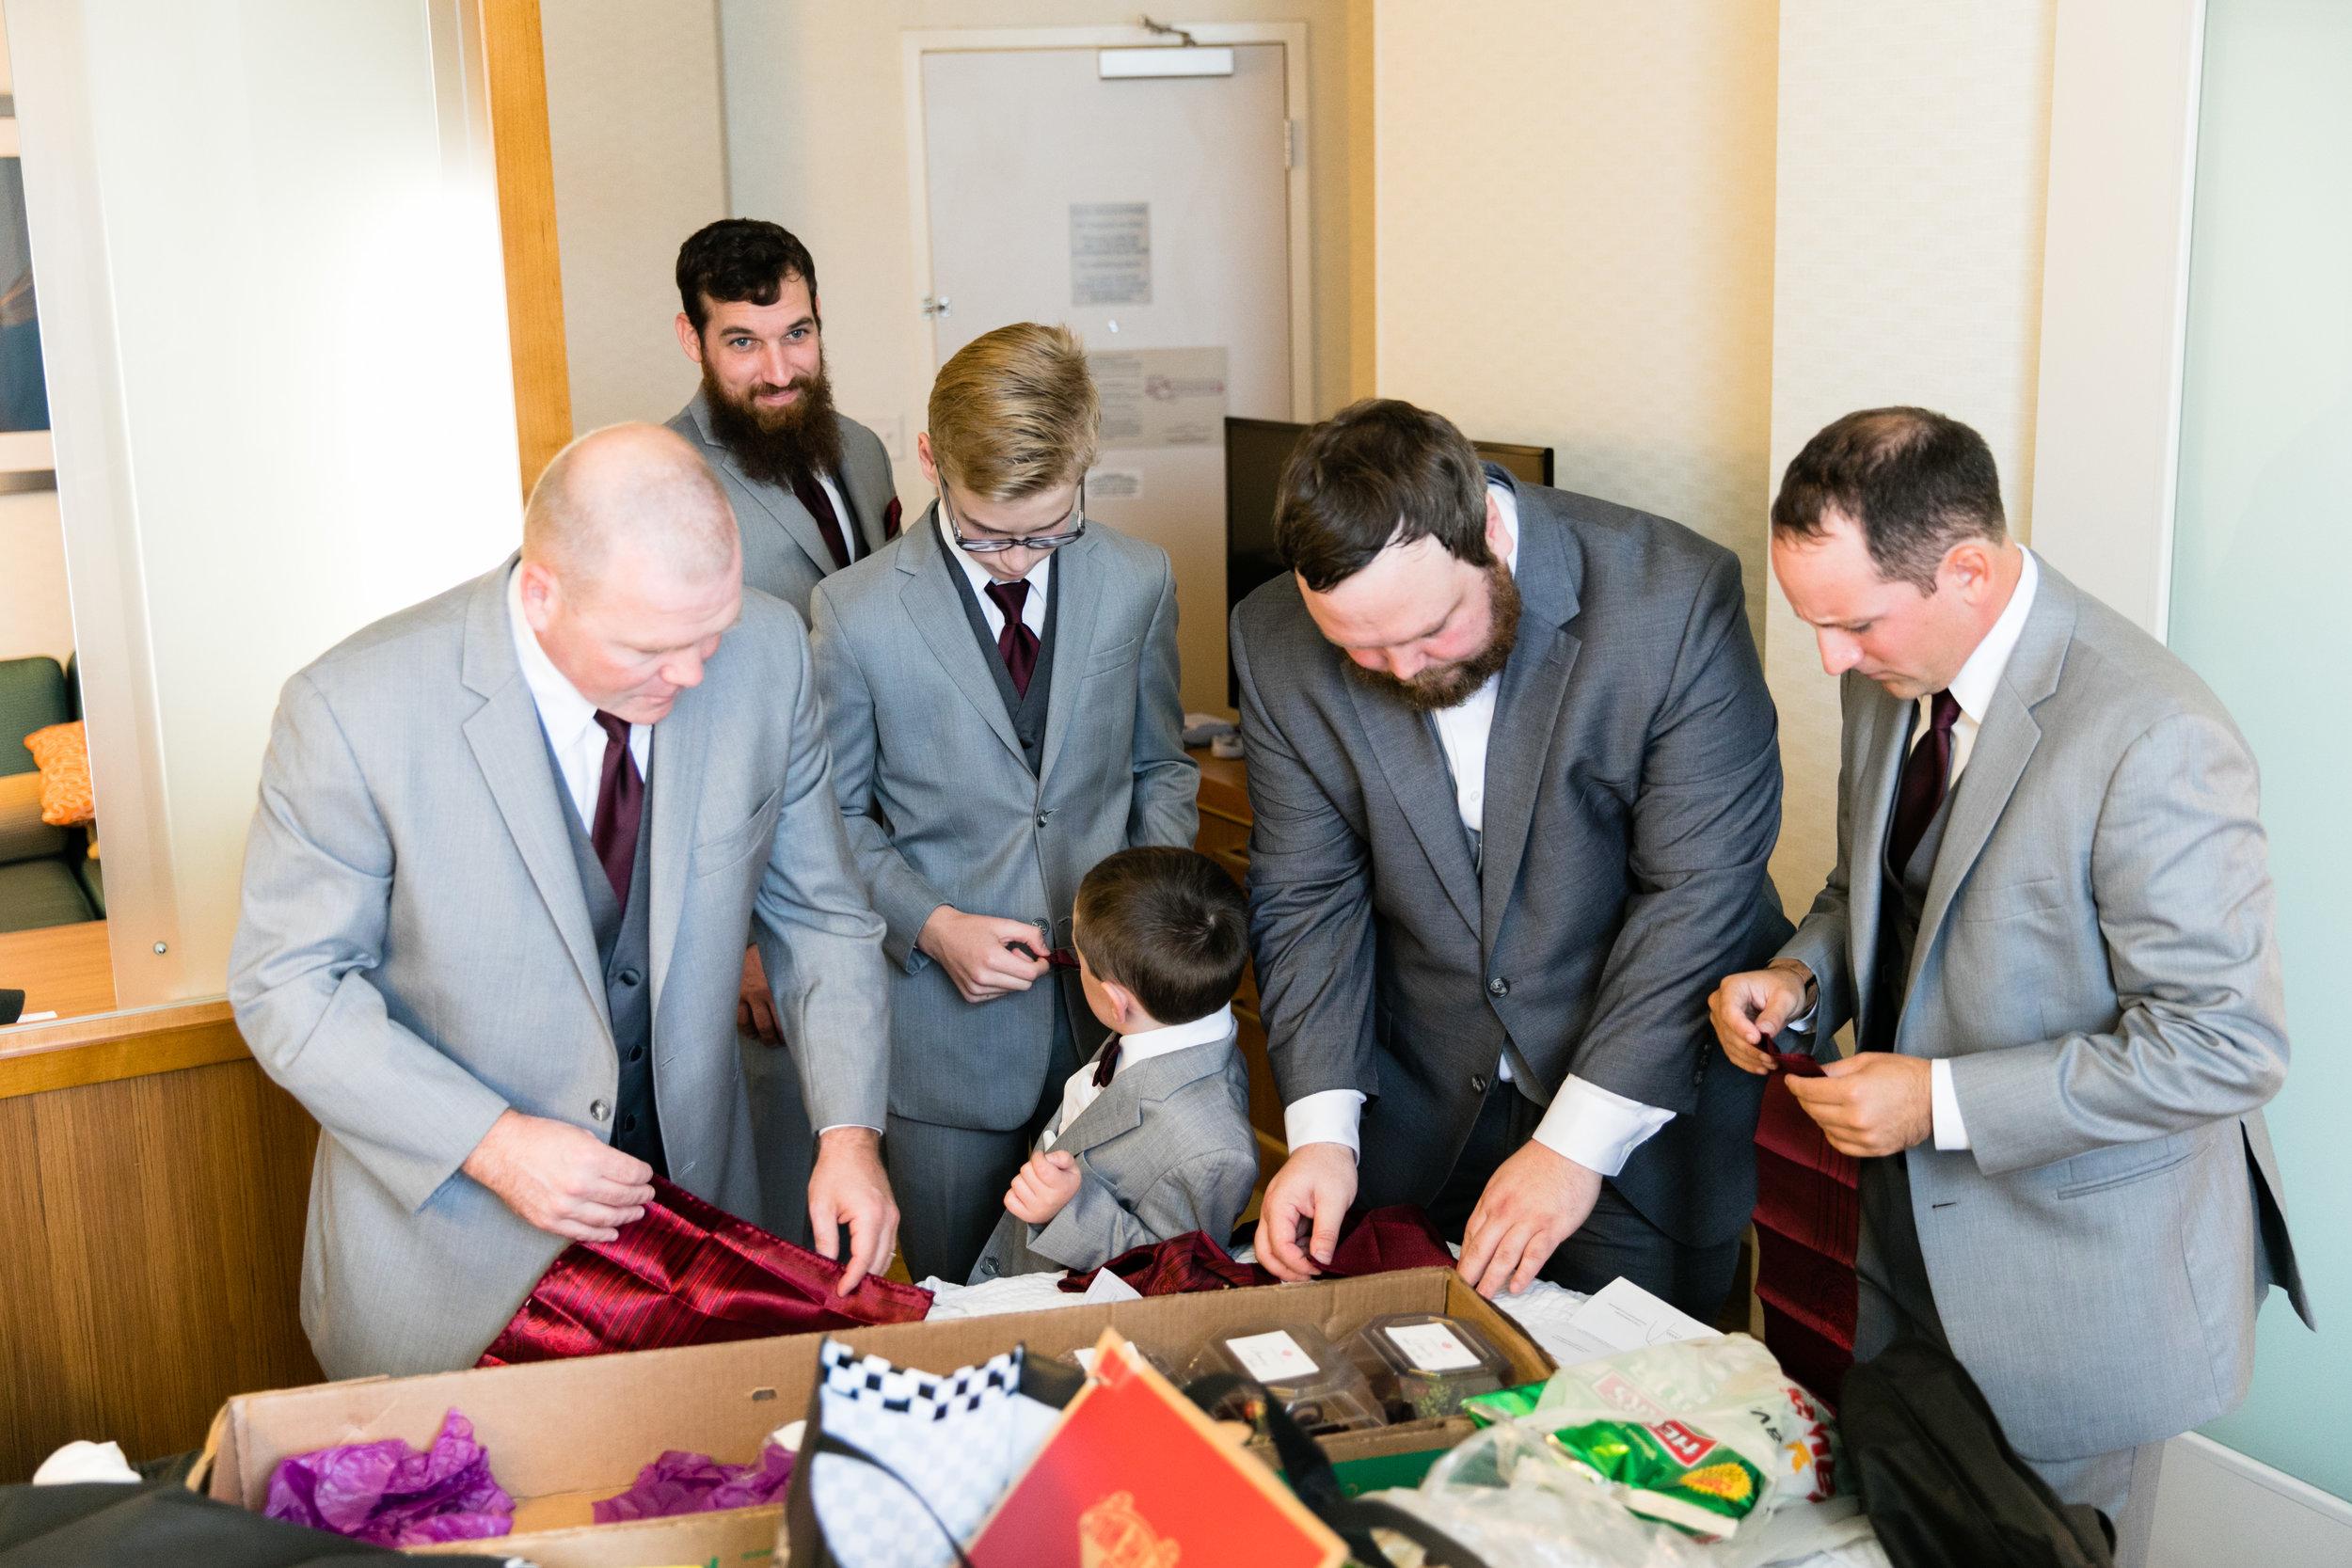 Medford Lakehouse Wedding Photographs -007.jpg